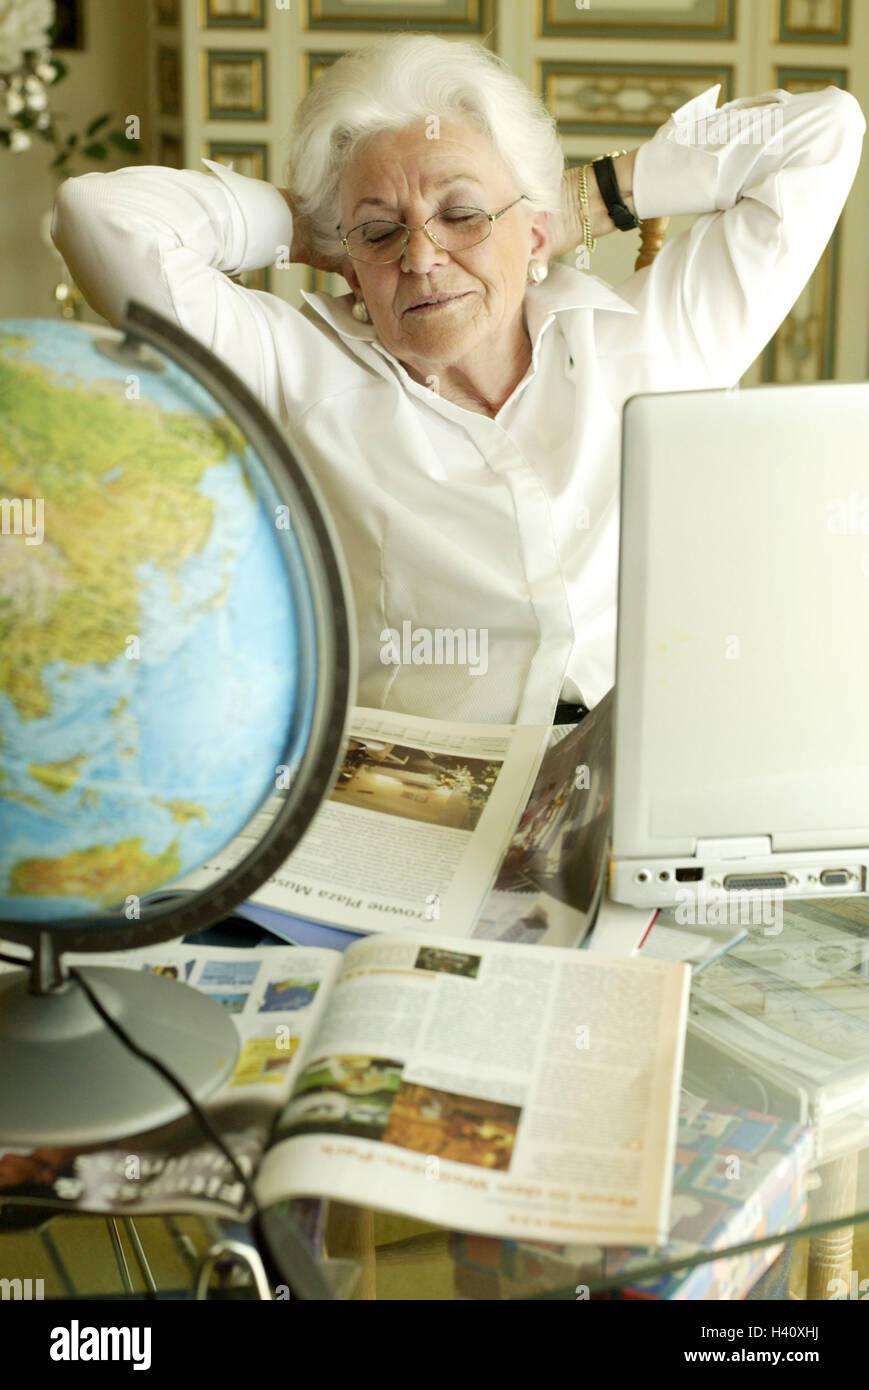 senior brille geste ist entspannung reisekatalog laptop globe halbe portr t freizeit. Black Bedroom Furniture Sets. Home Design Ideas